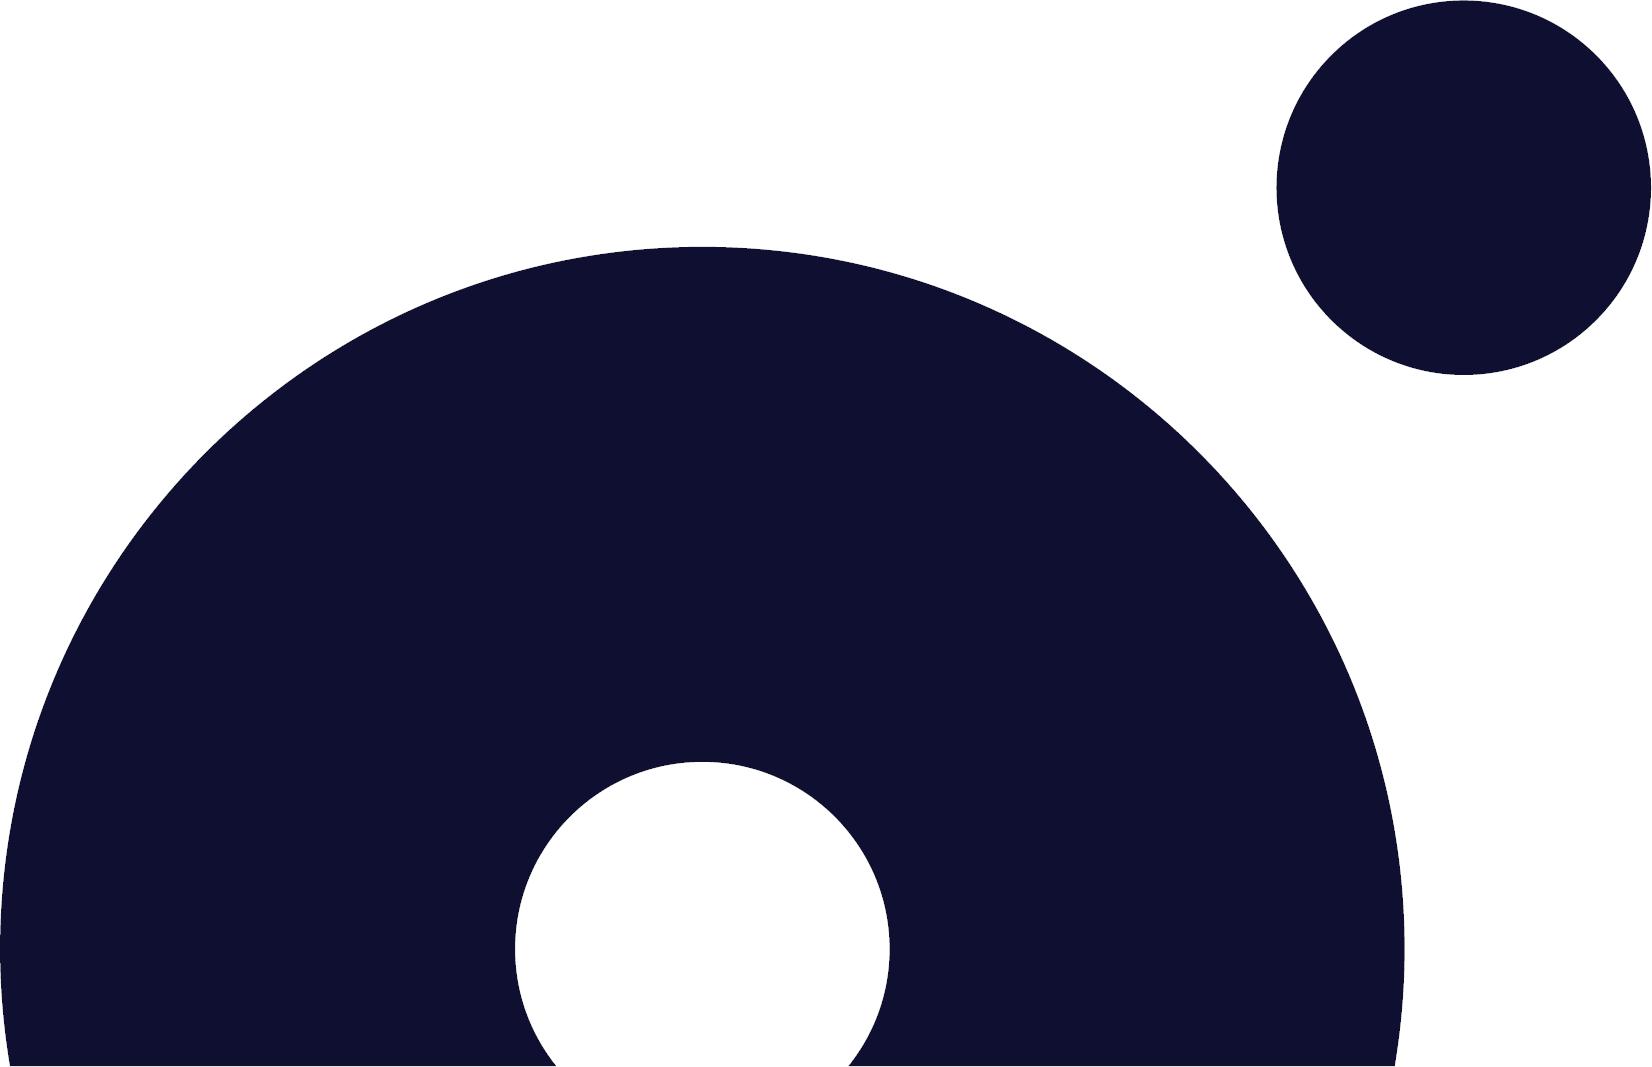 Swvhu3hs9k5dyusjwuea nanome logo mark darkblue